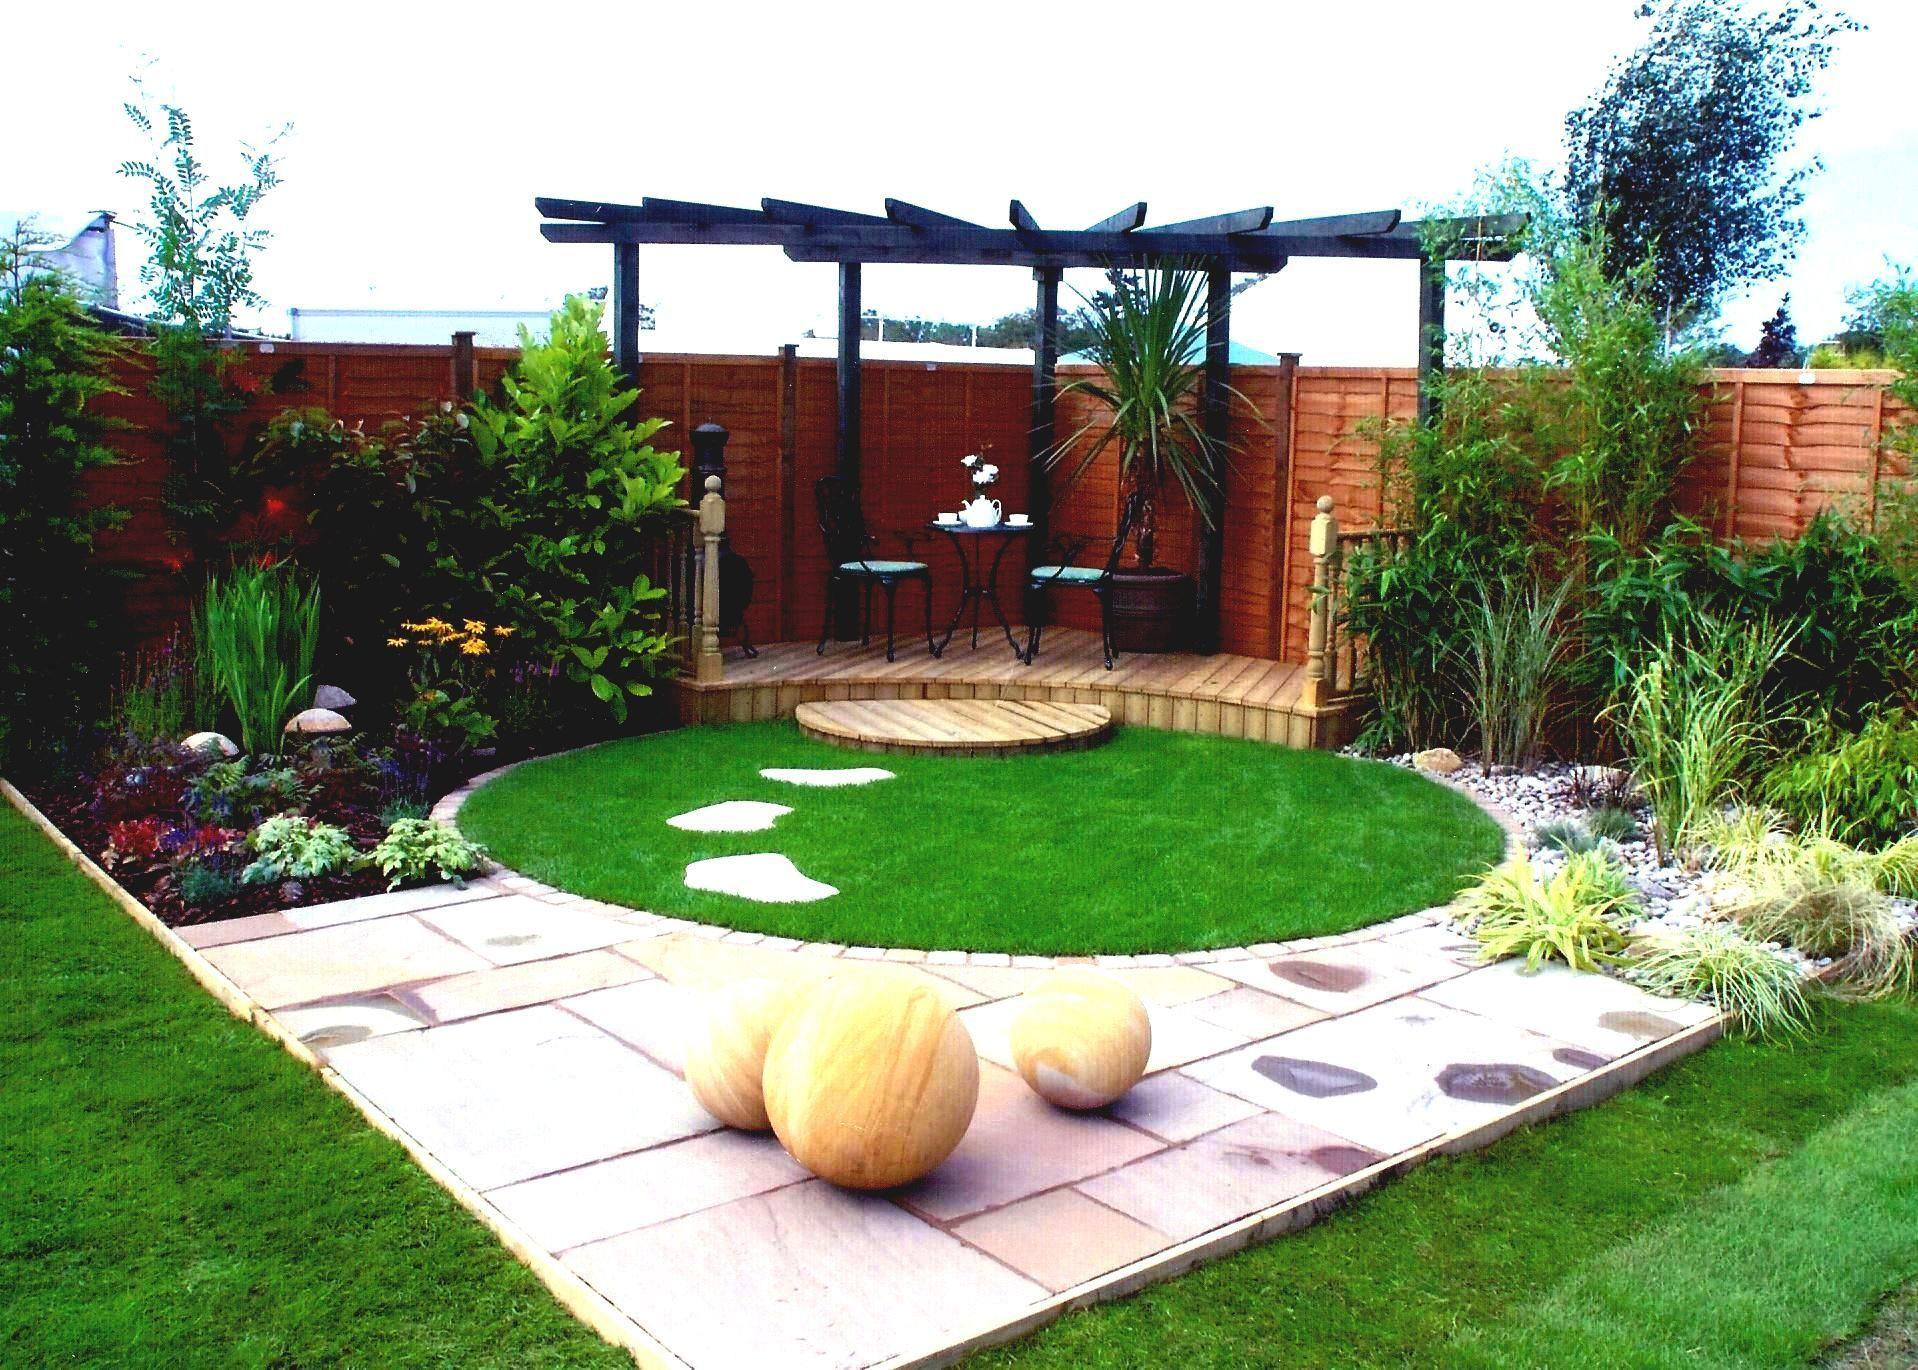 Small Garden Google Search Best Outdoor Landscaping Ideas Images On Pinterest Cdececeaa Trends Small Garden Landscape Courtyard Gardens Design Contemporary Garden Design